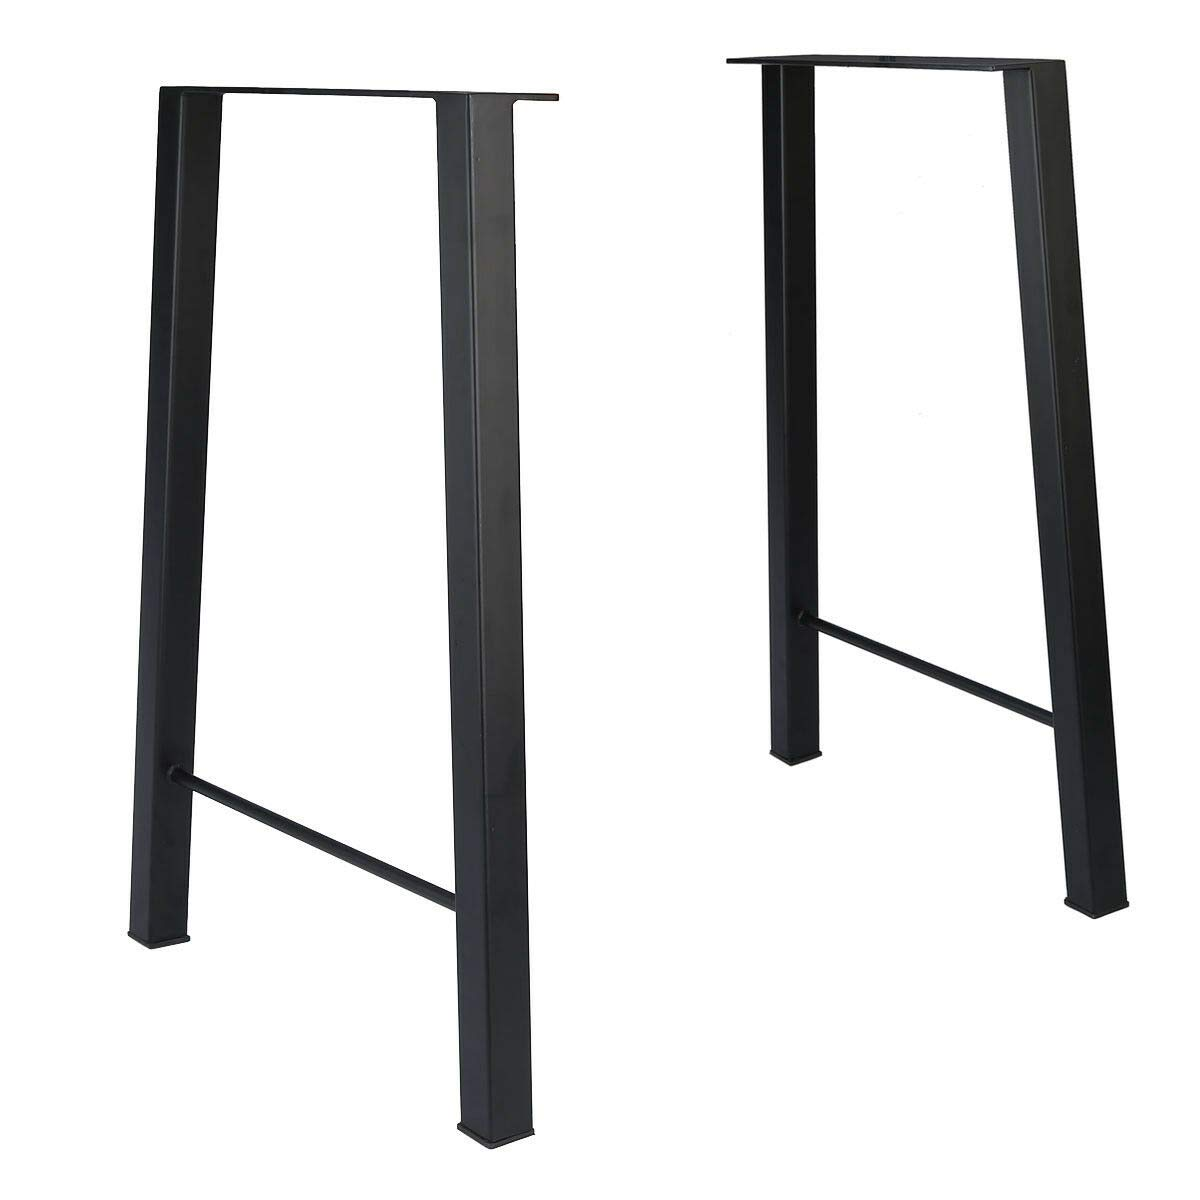 Tengchang 28'' Industry Dinner Table Leg Metal Steel Bench Legs DIY Furniture by Tengchang